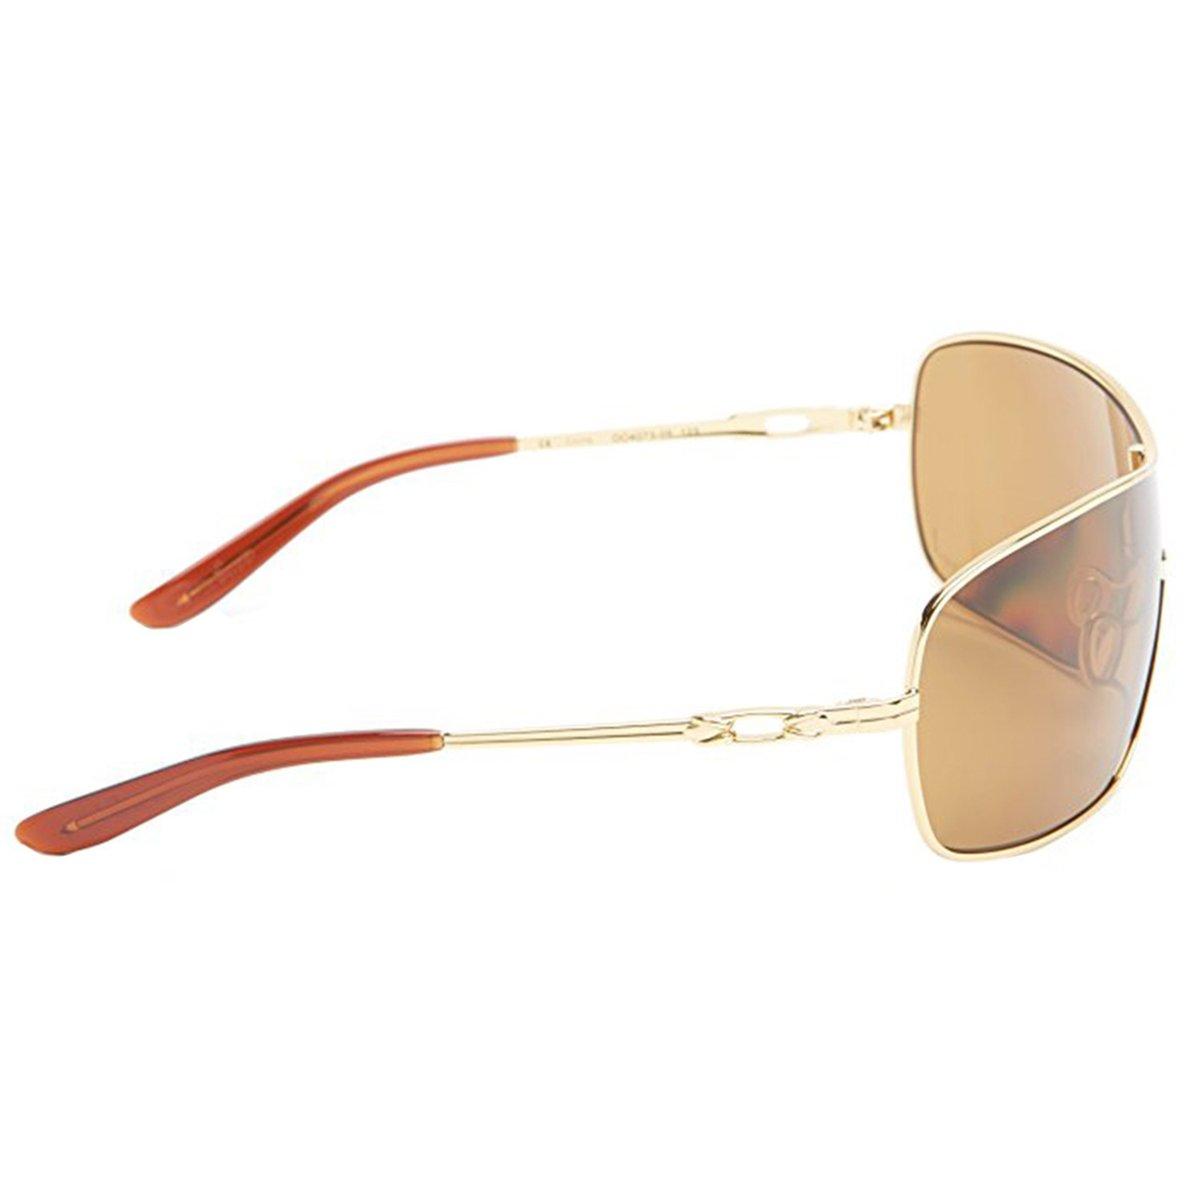 4200a1c486c30 Óculos Oakley Distress - Compre Agora